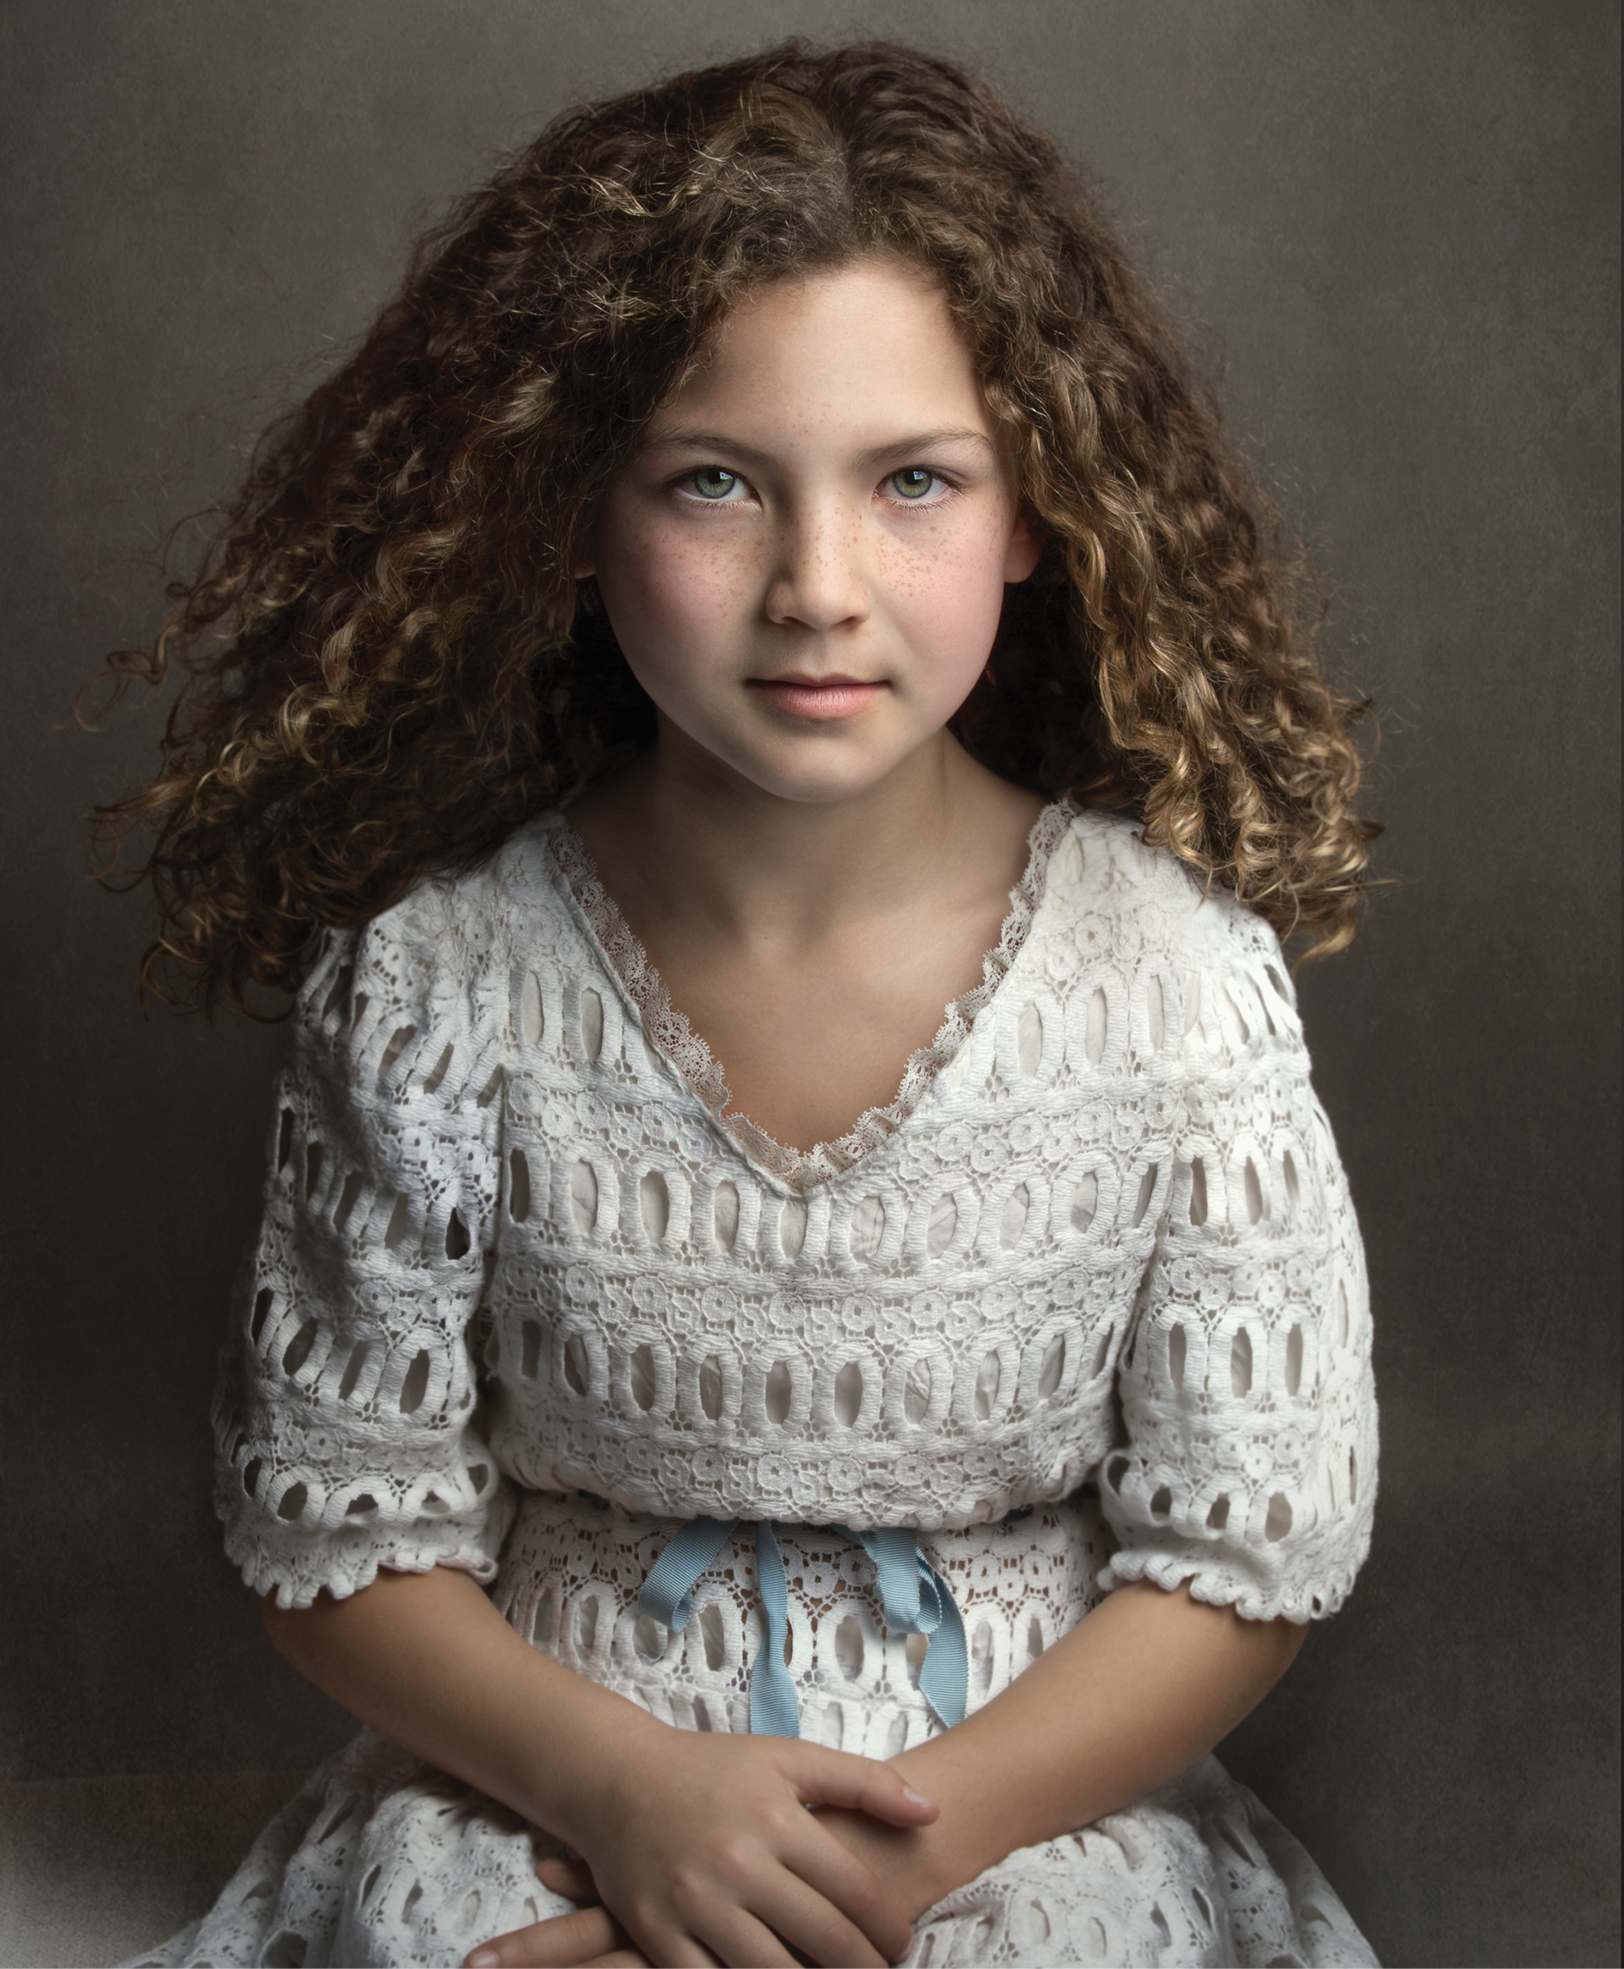 FIne-Art-Child-Portraits-3.jpg